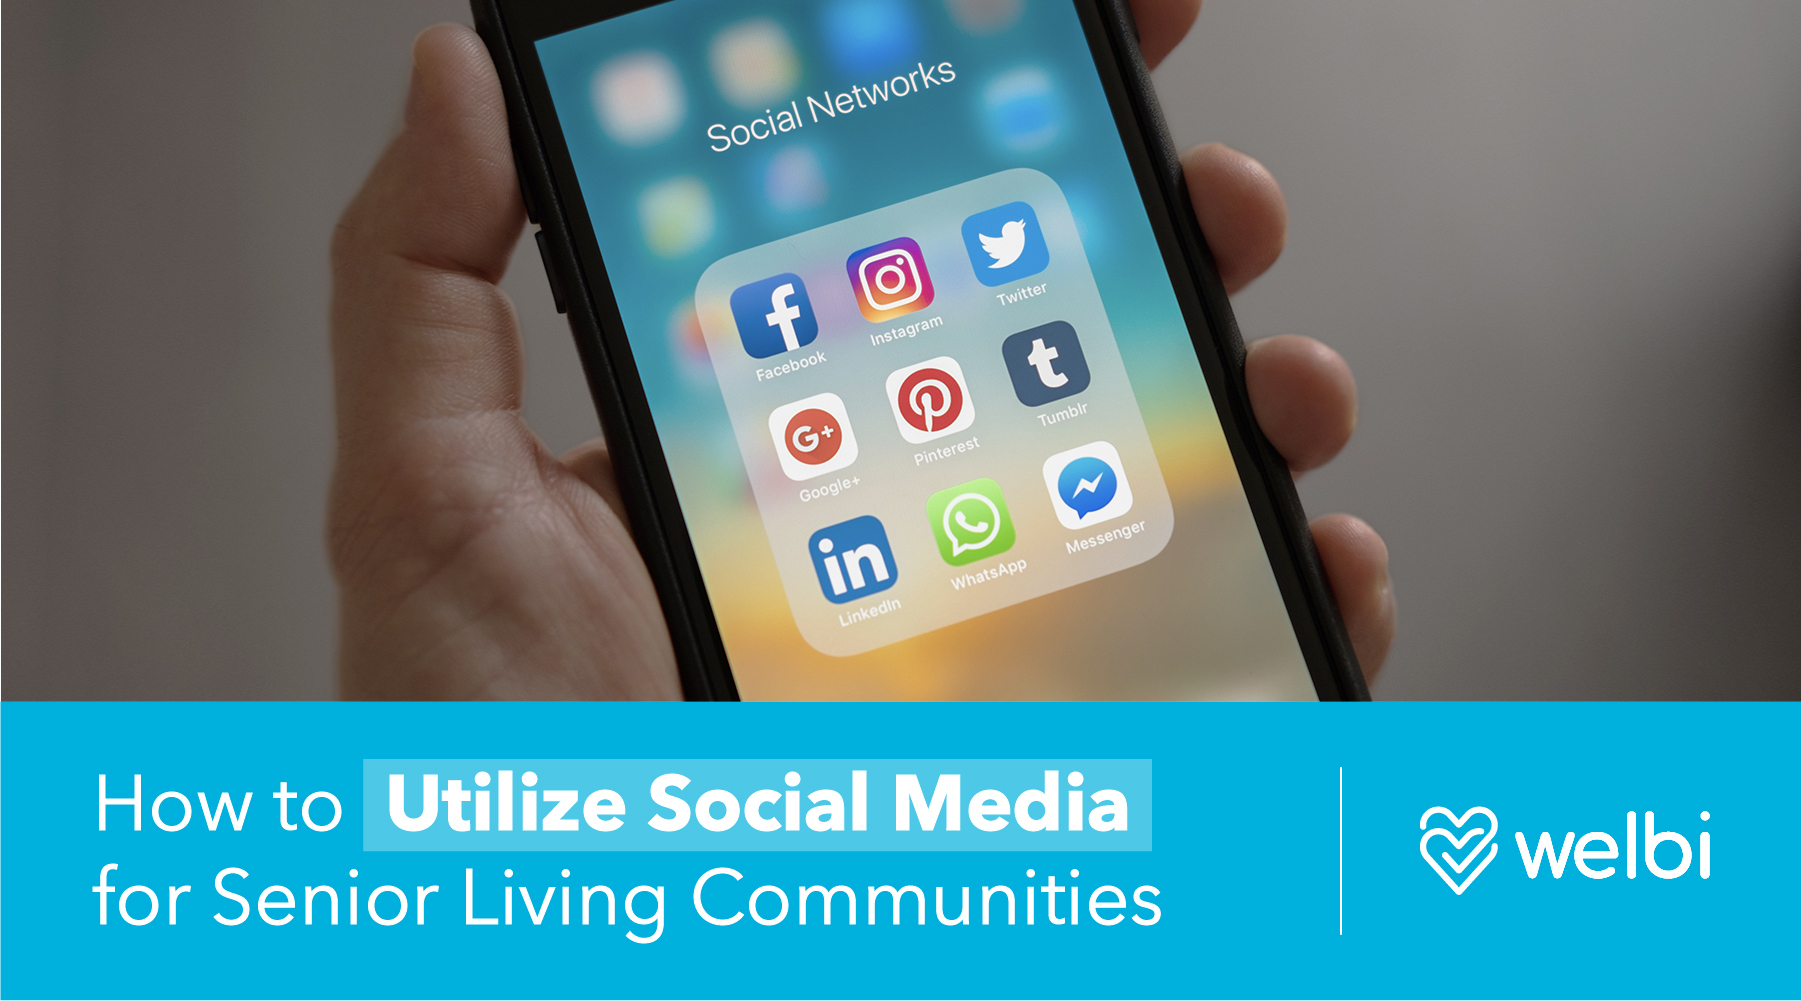 How to Utilize Social Media for Senior Living Communities